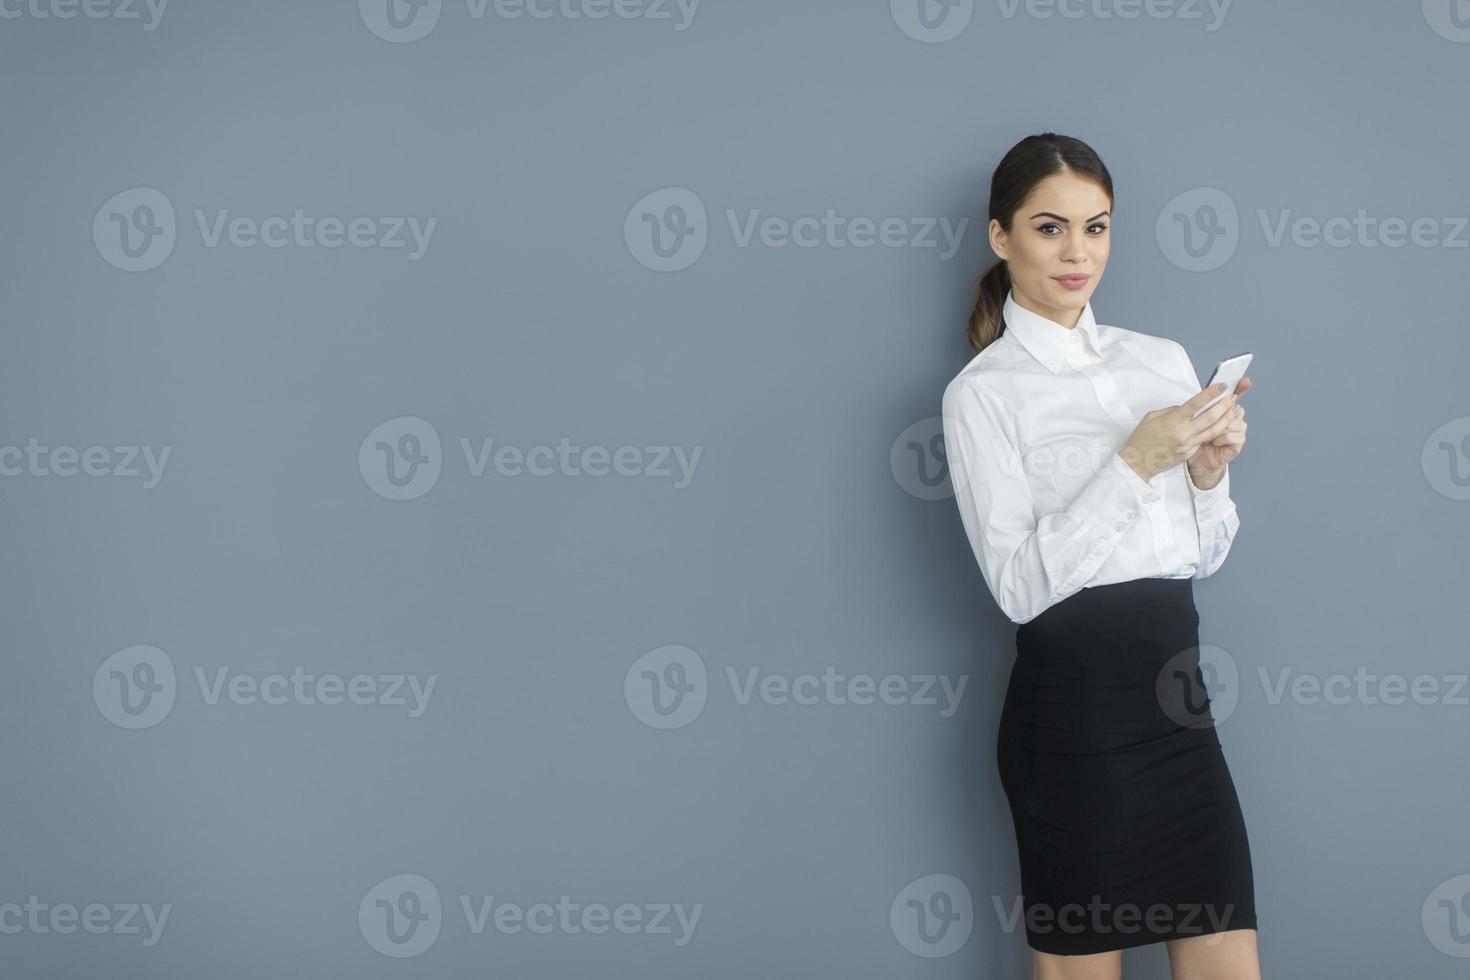 junge Frau an der Wand foto